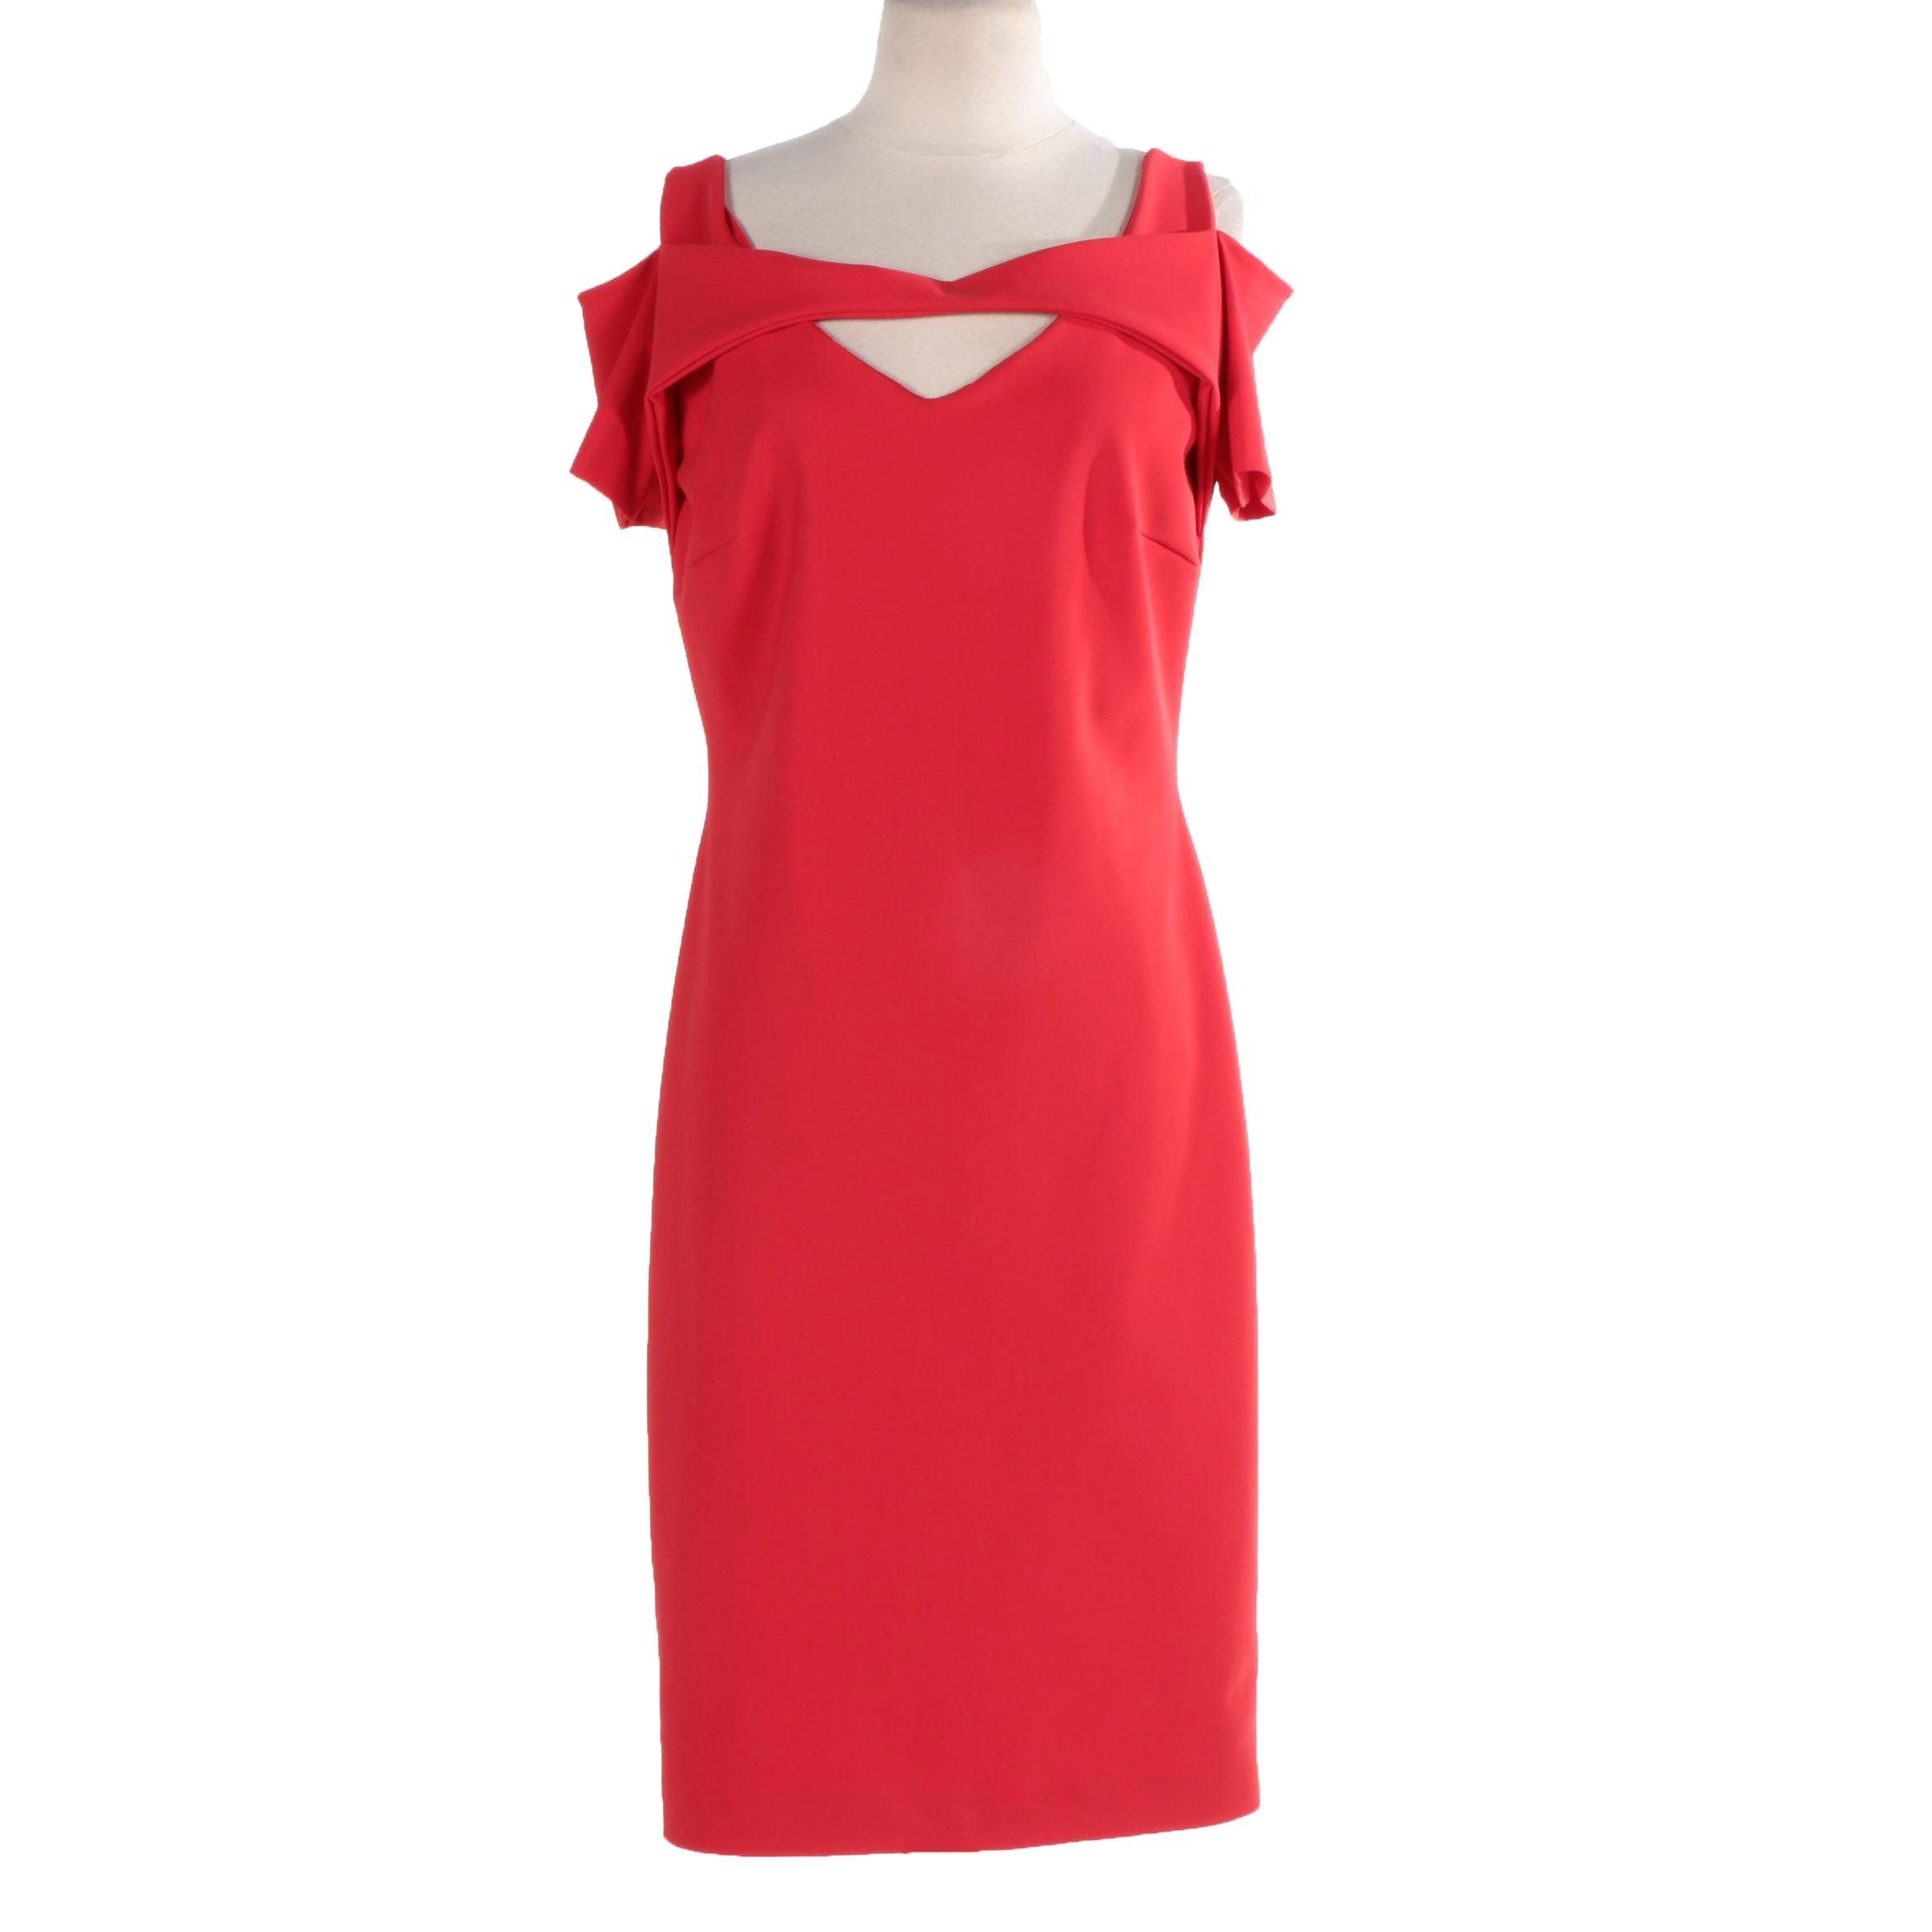 Off the Shoulder La Petite Robe di Chiara Boni Dress